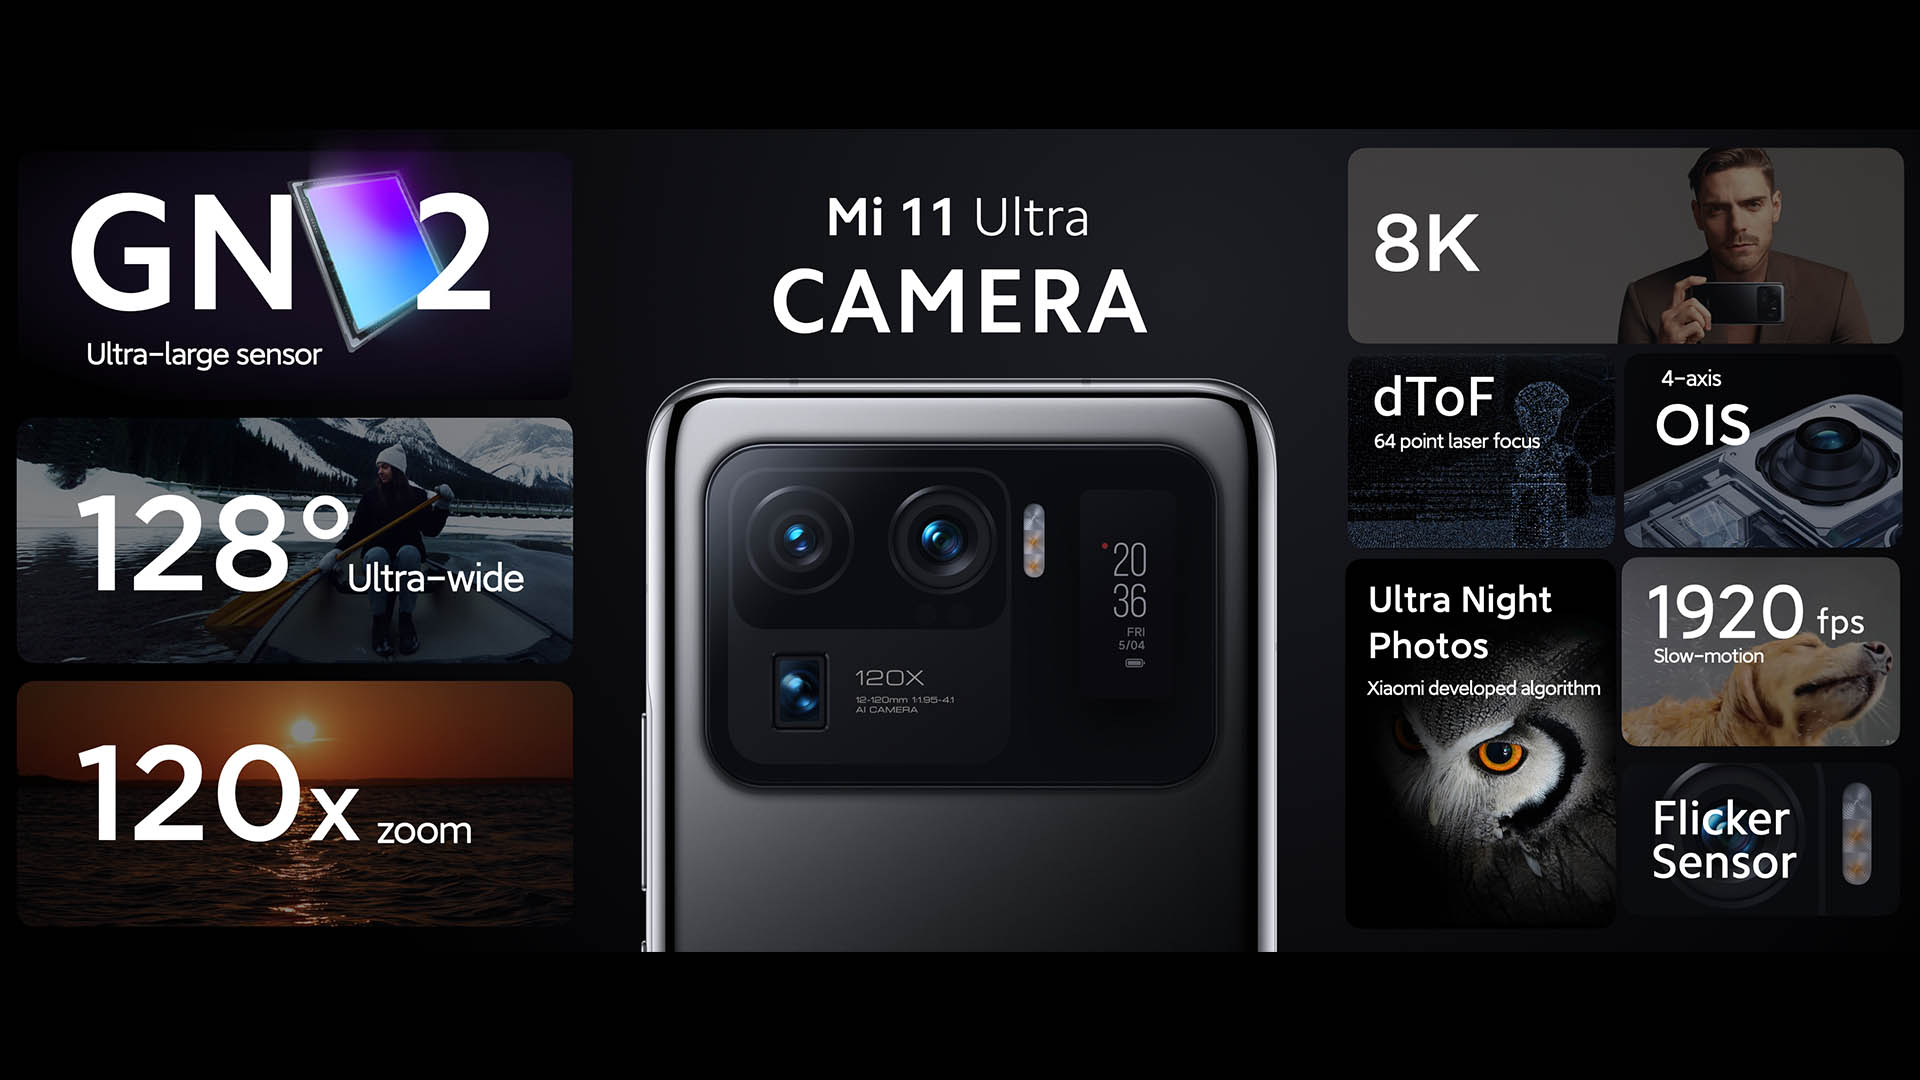 Toto sú parametre nového Xiaomi Mi 11 Ultra